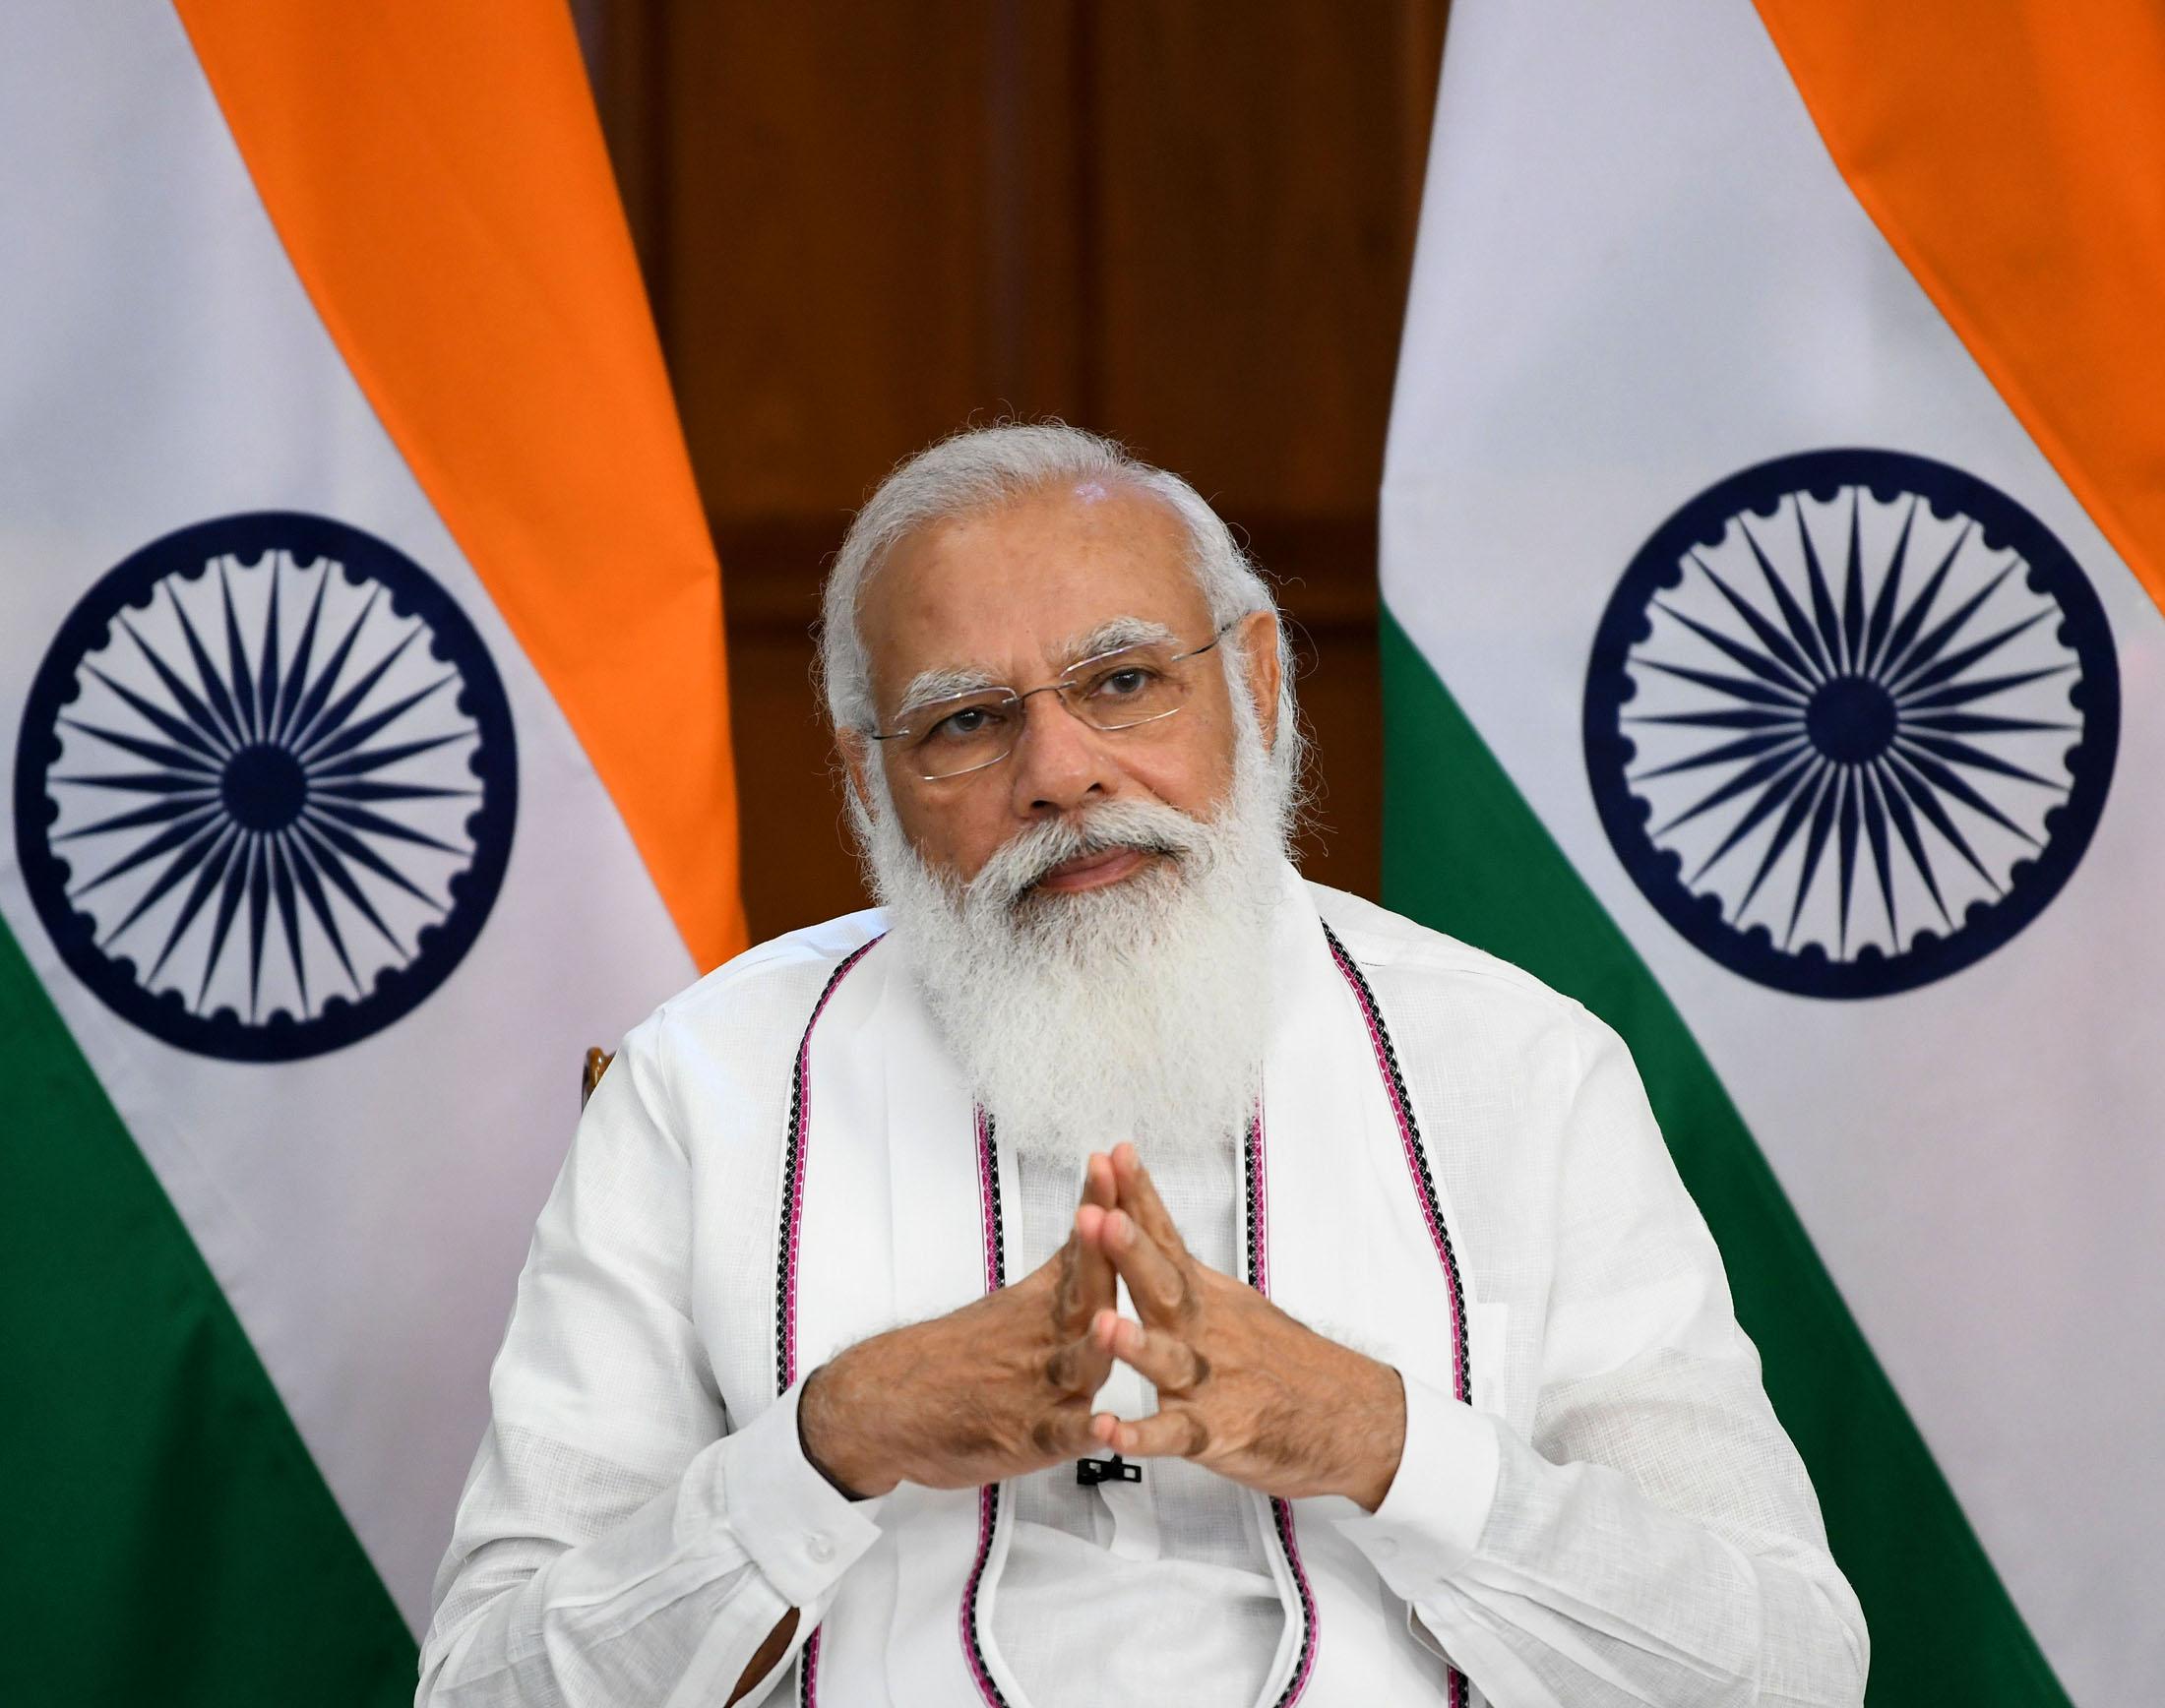 The Prime Minister, Shri Narendra Modi interacts with the beneficiaries of Pradhan Mantri Garib Kalyan Anna Yojana in Gujarat, through video conferencing, in New Delhi on August 03, 2021.